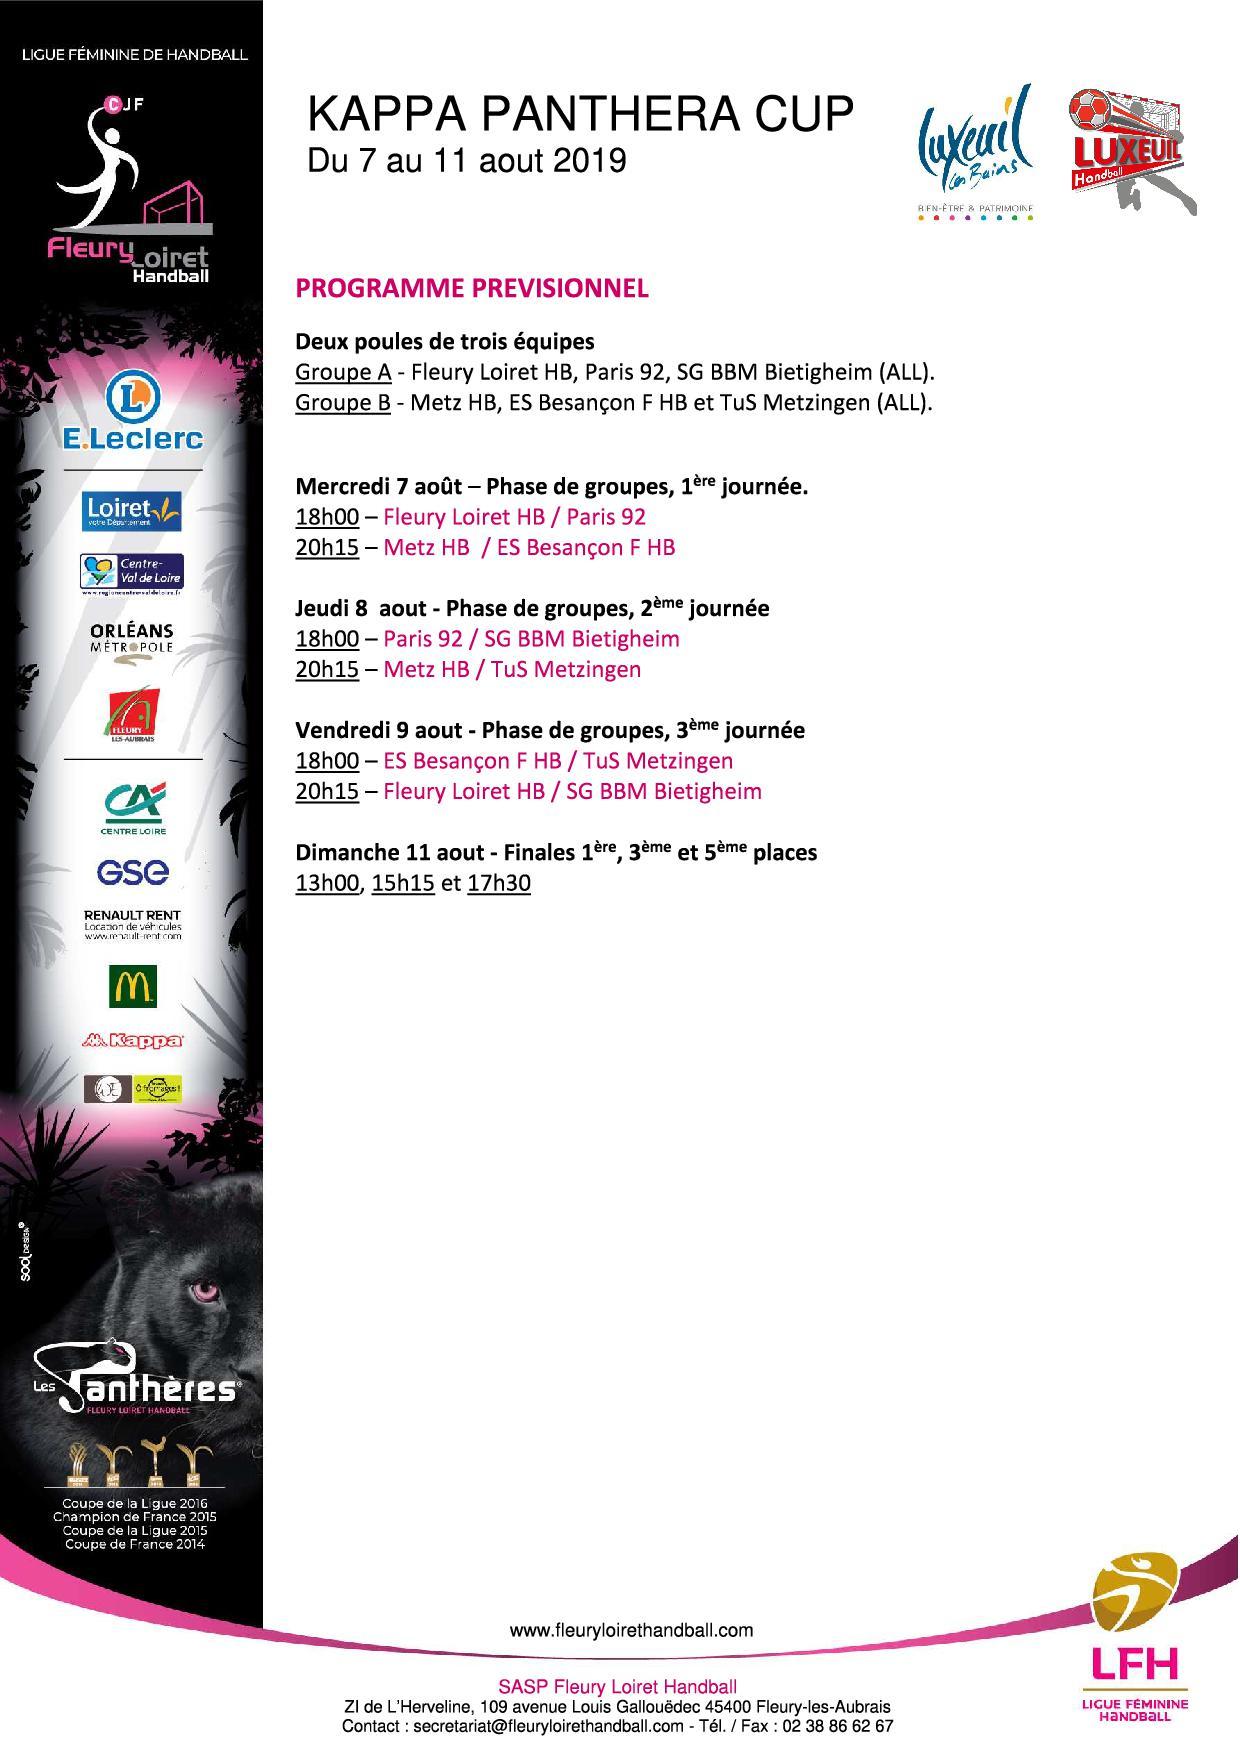 Communiqué Fleury Loiret Handball - Jeudi 20 juin 2019 - Communiqué Fleury Loiret Handball - Jeudi 20 juin 20193.jpg